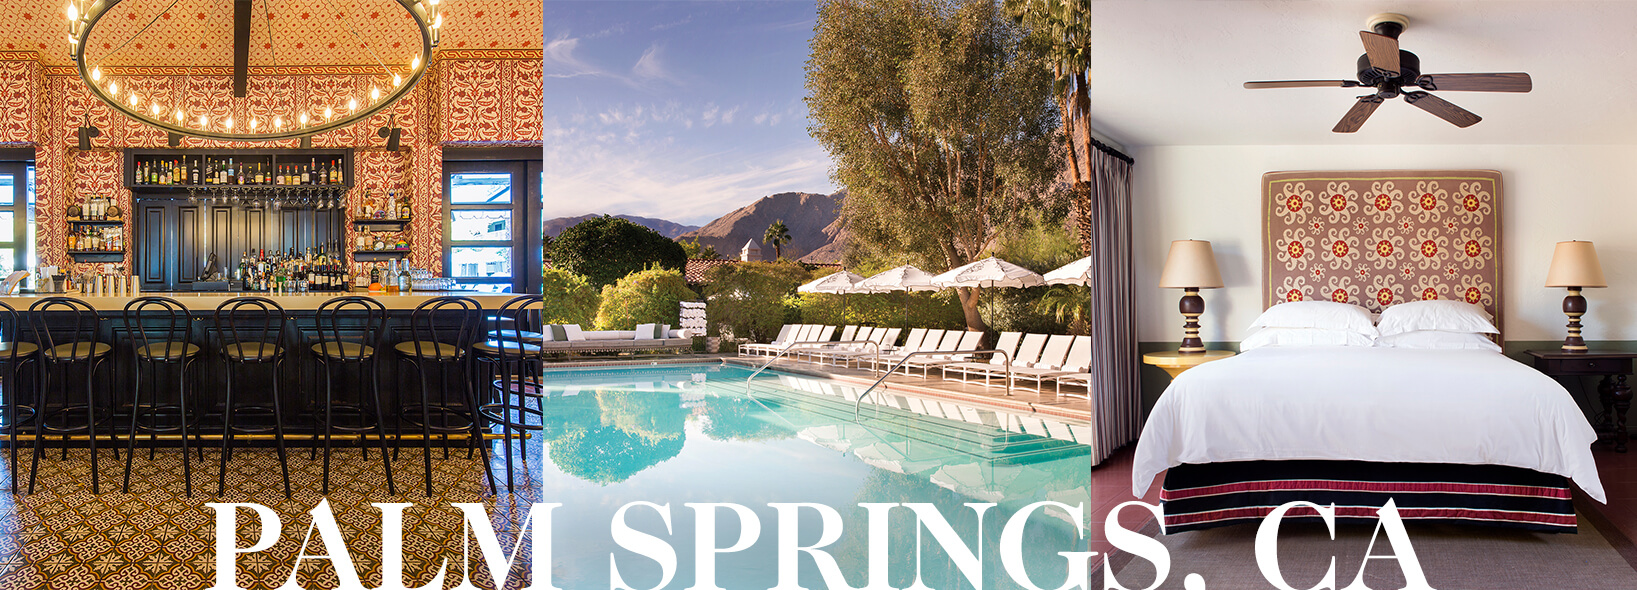 Palm Springs, California header